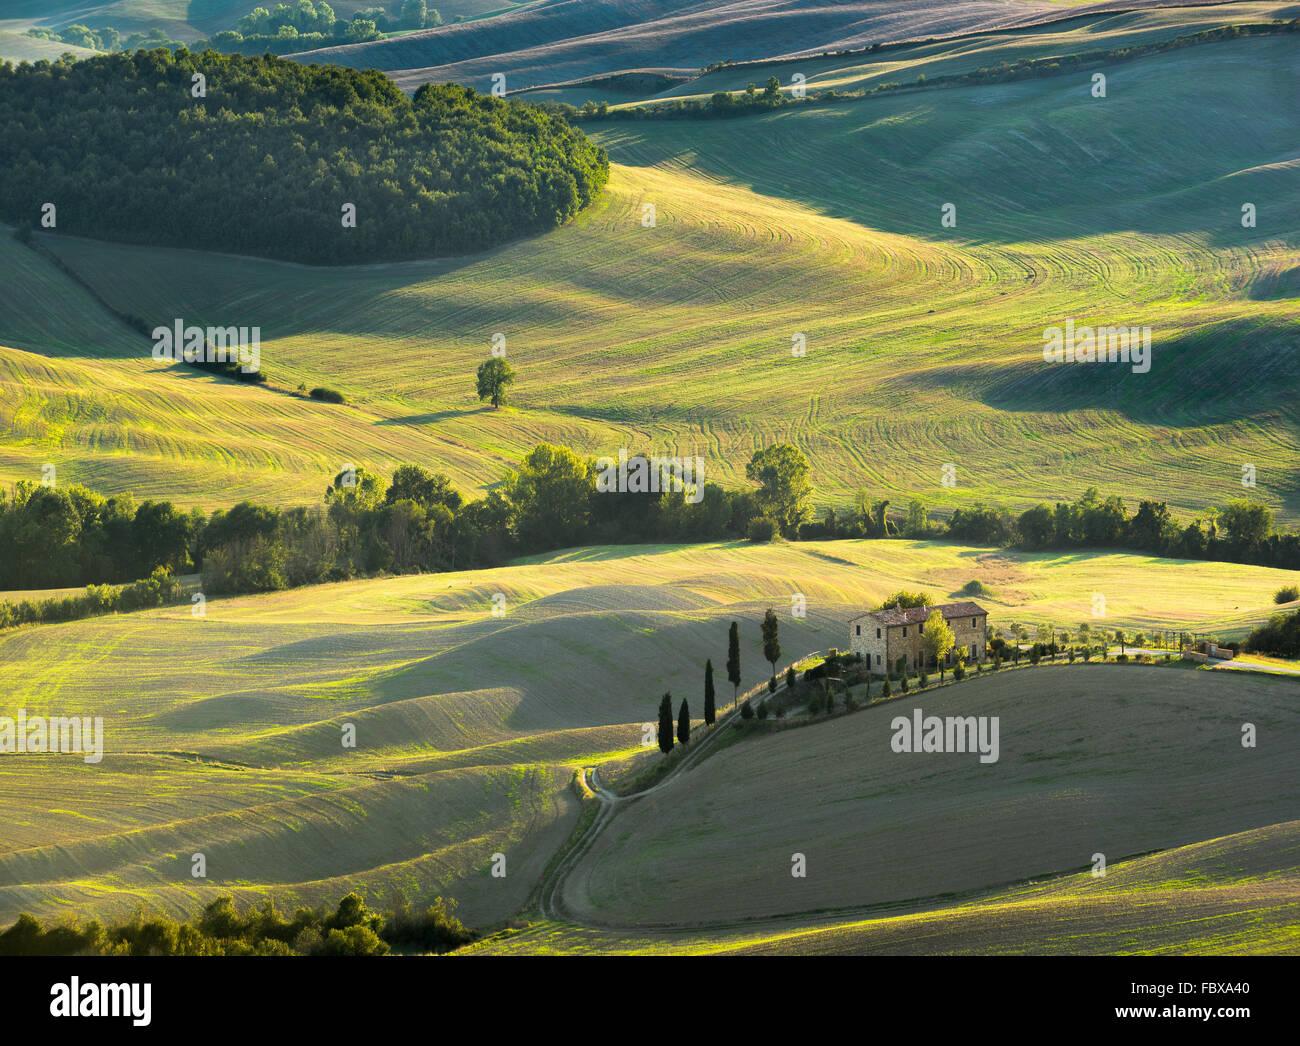 Toskanische Landschaft der Nationalpark des Val d ' Orcia, ein UNESCO-Weltkulturerbe Stockbild